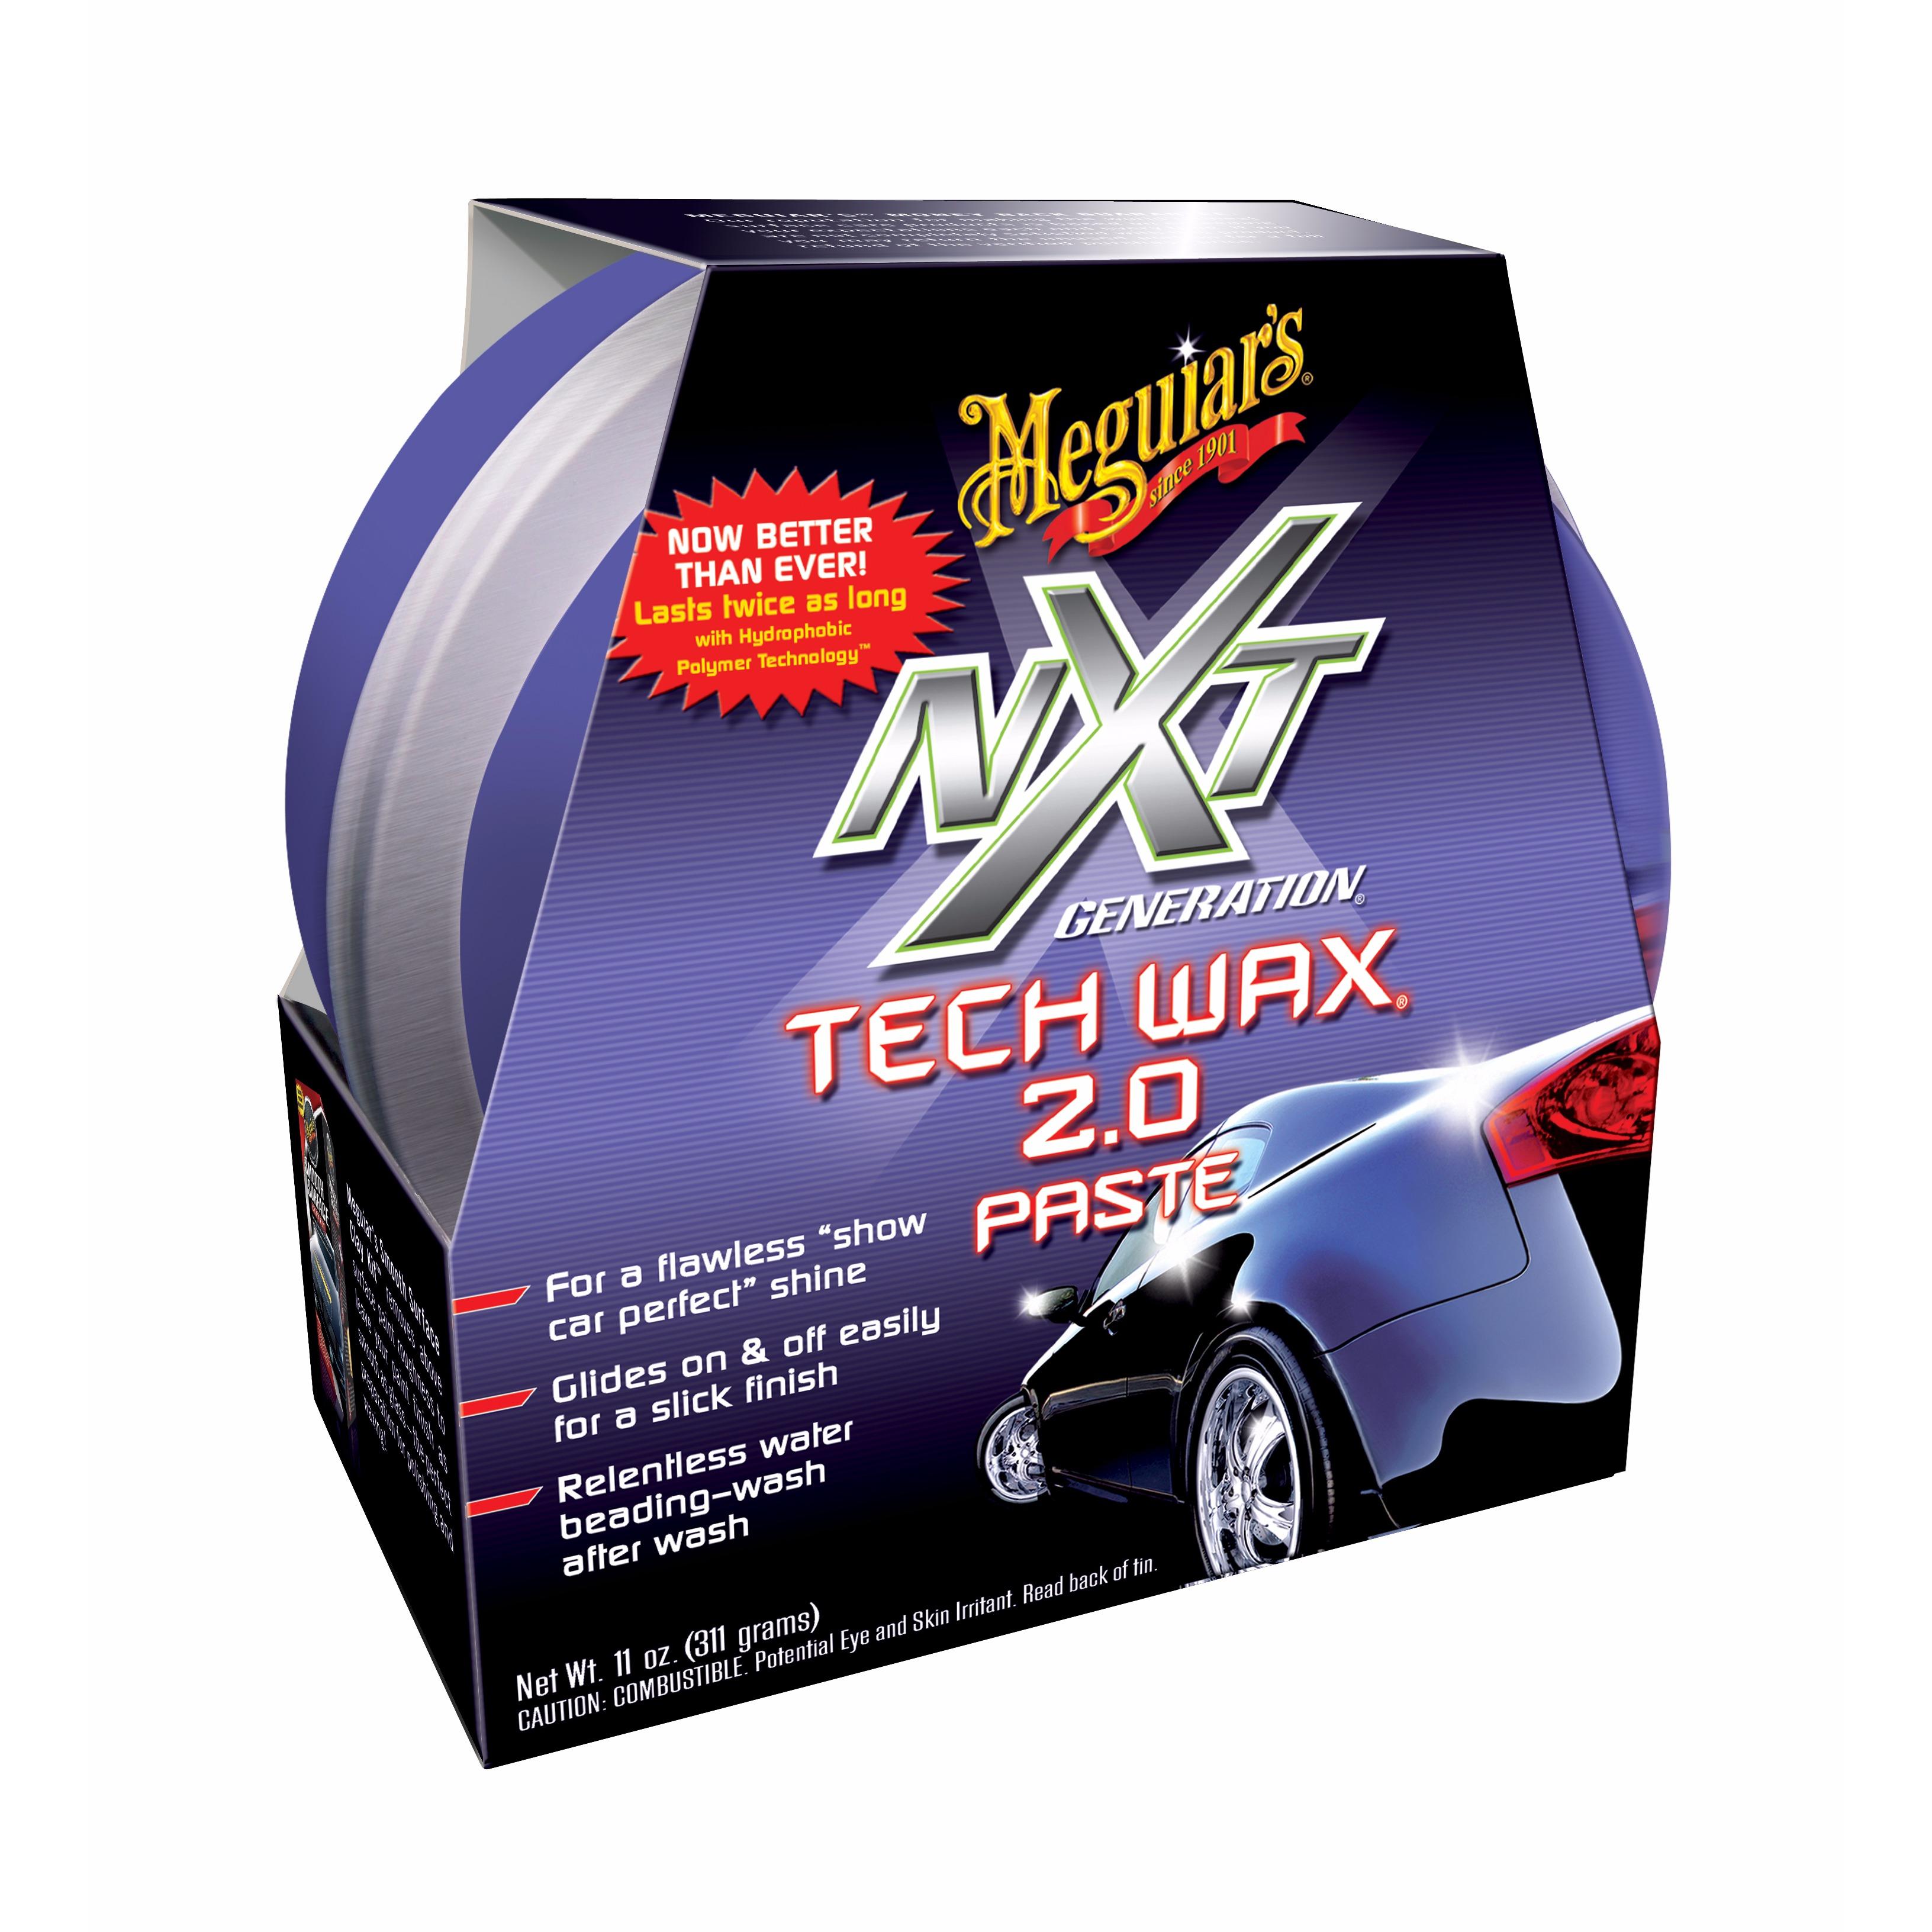 NXT GENERATION 2.0 PASTE WAX (G12711)